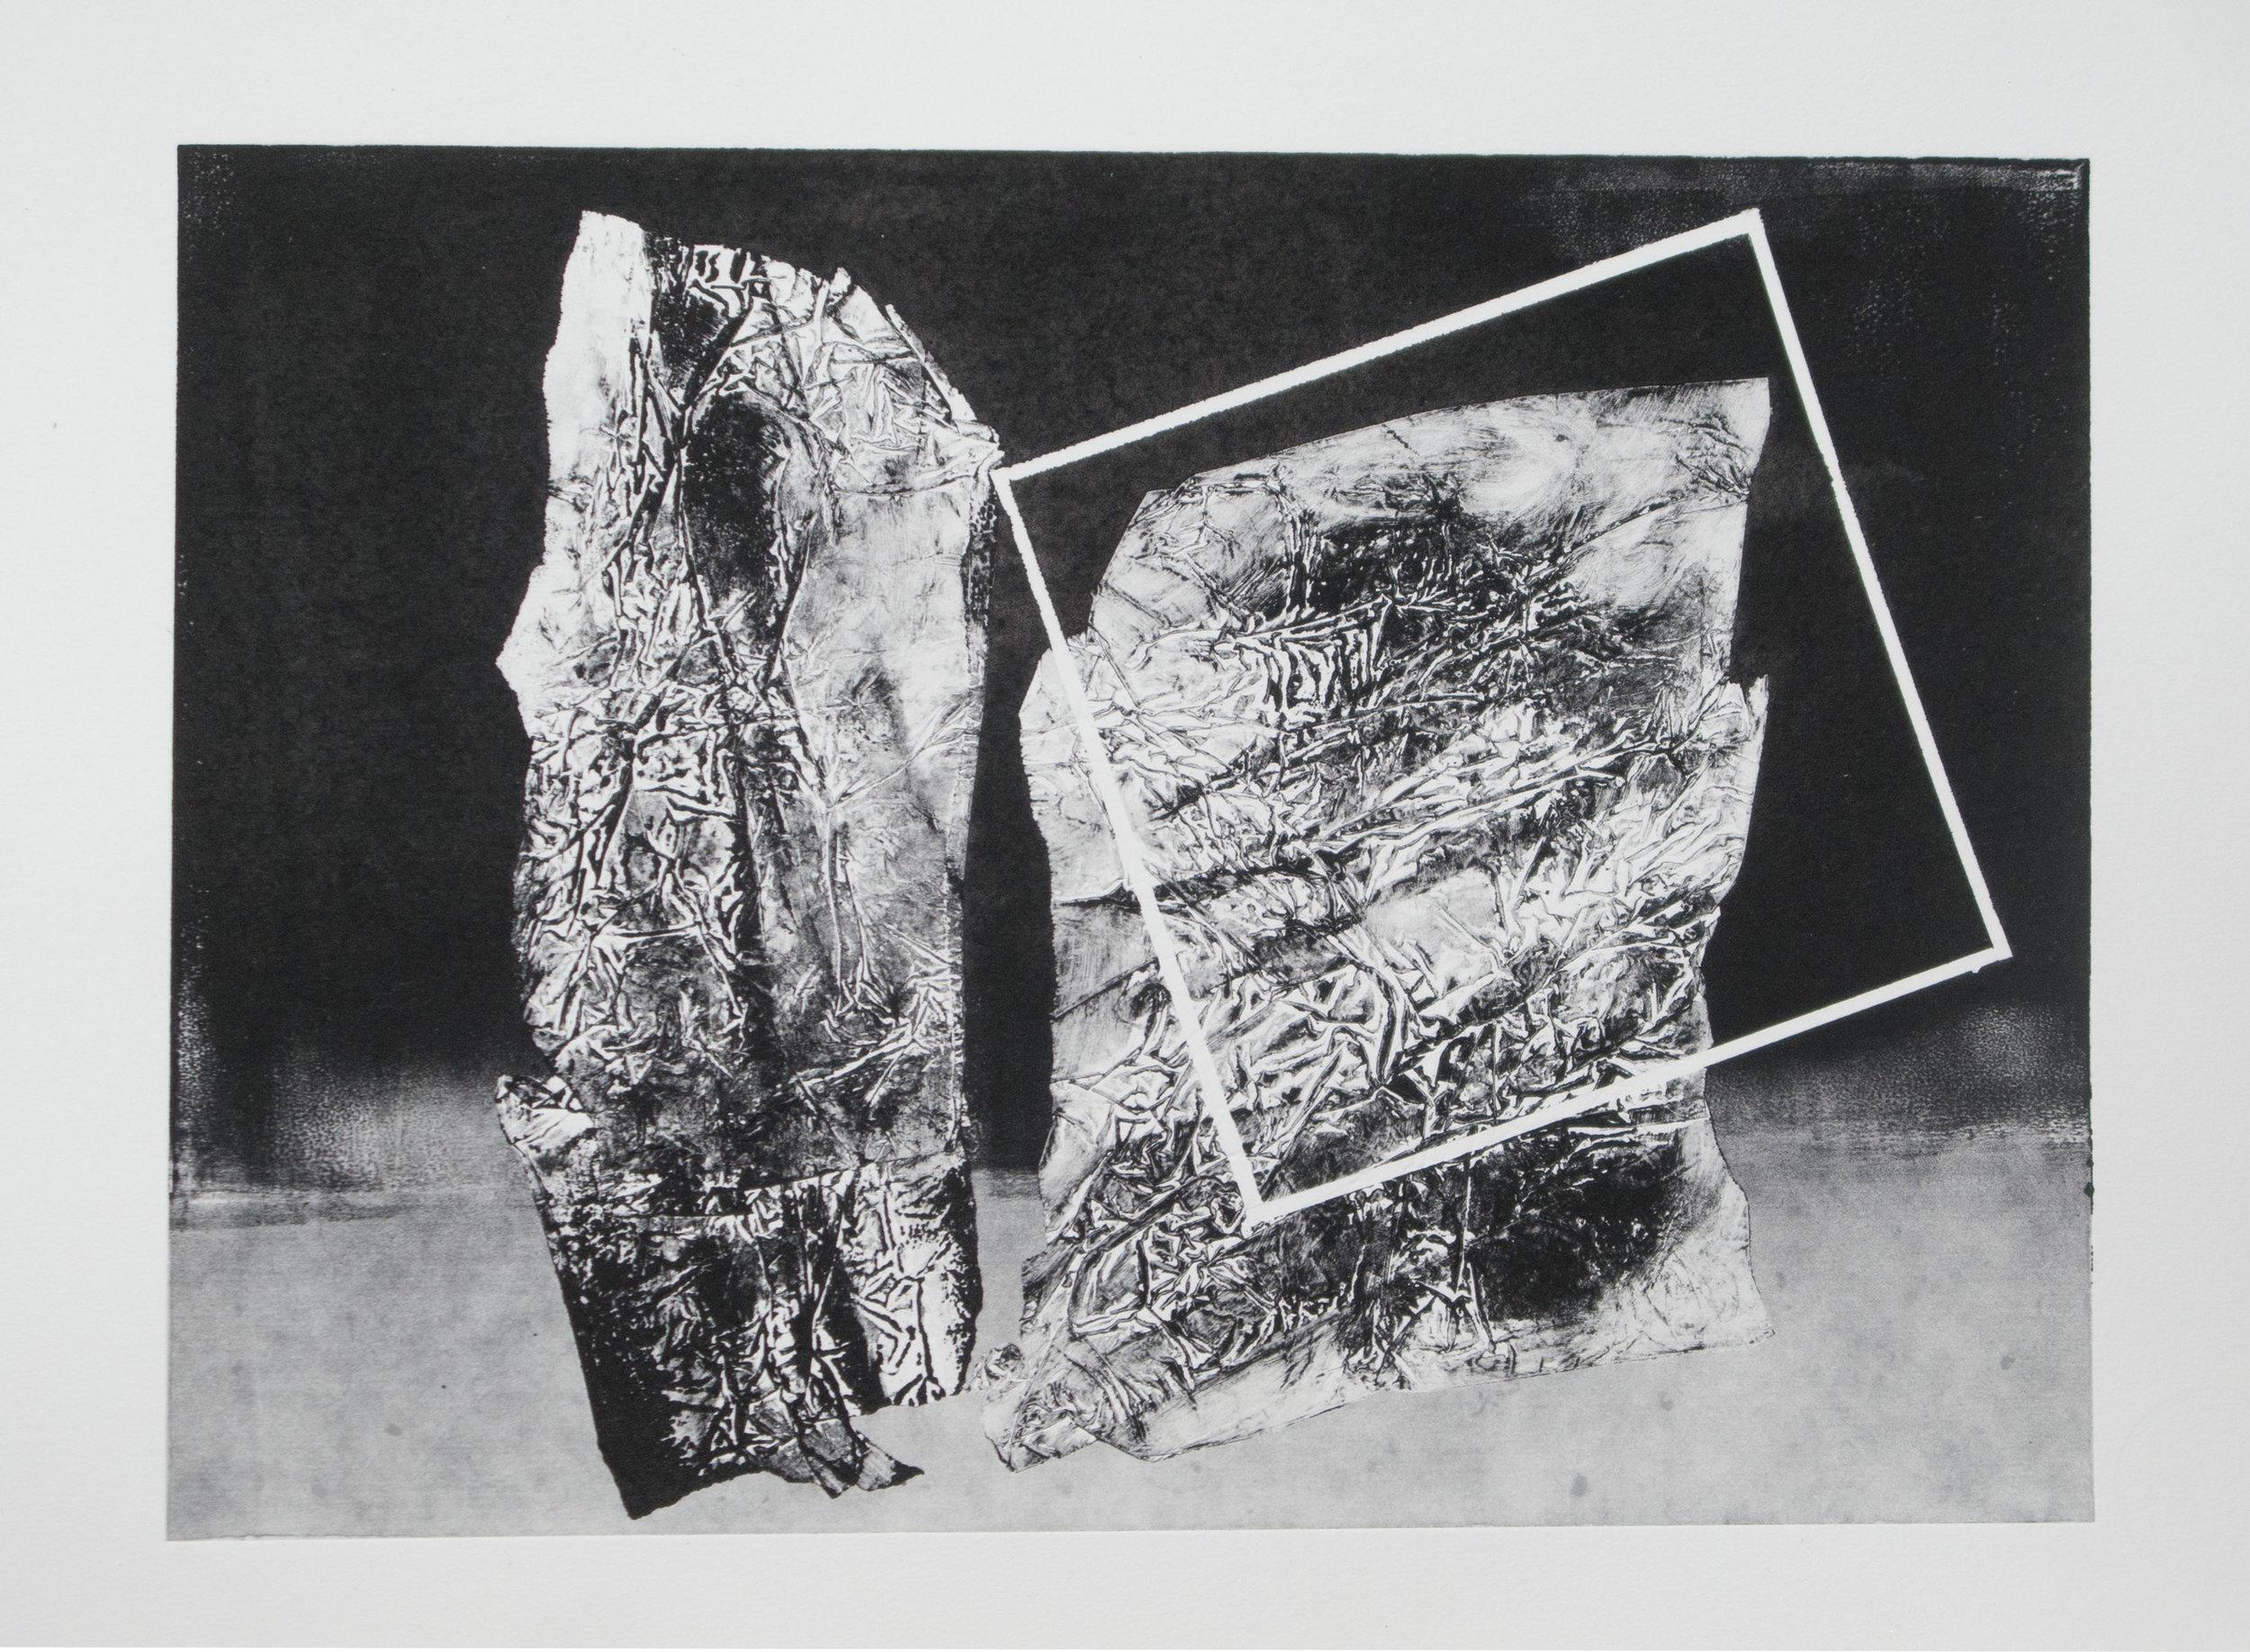 Forms on black 23 (32cm x 26 cm)